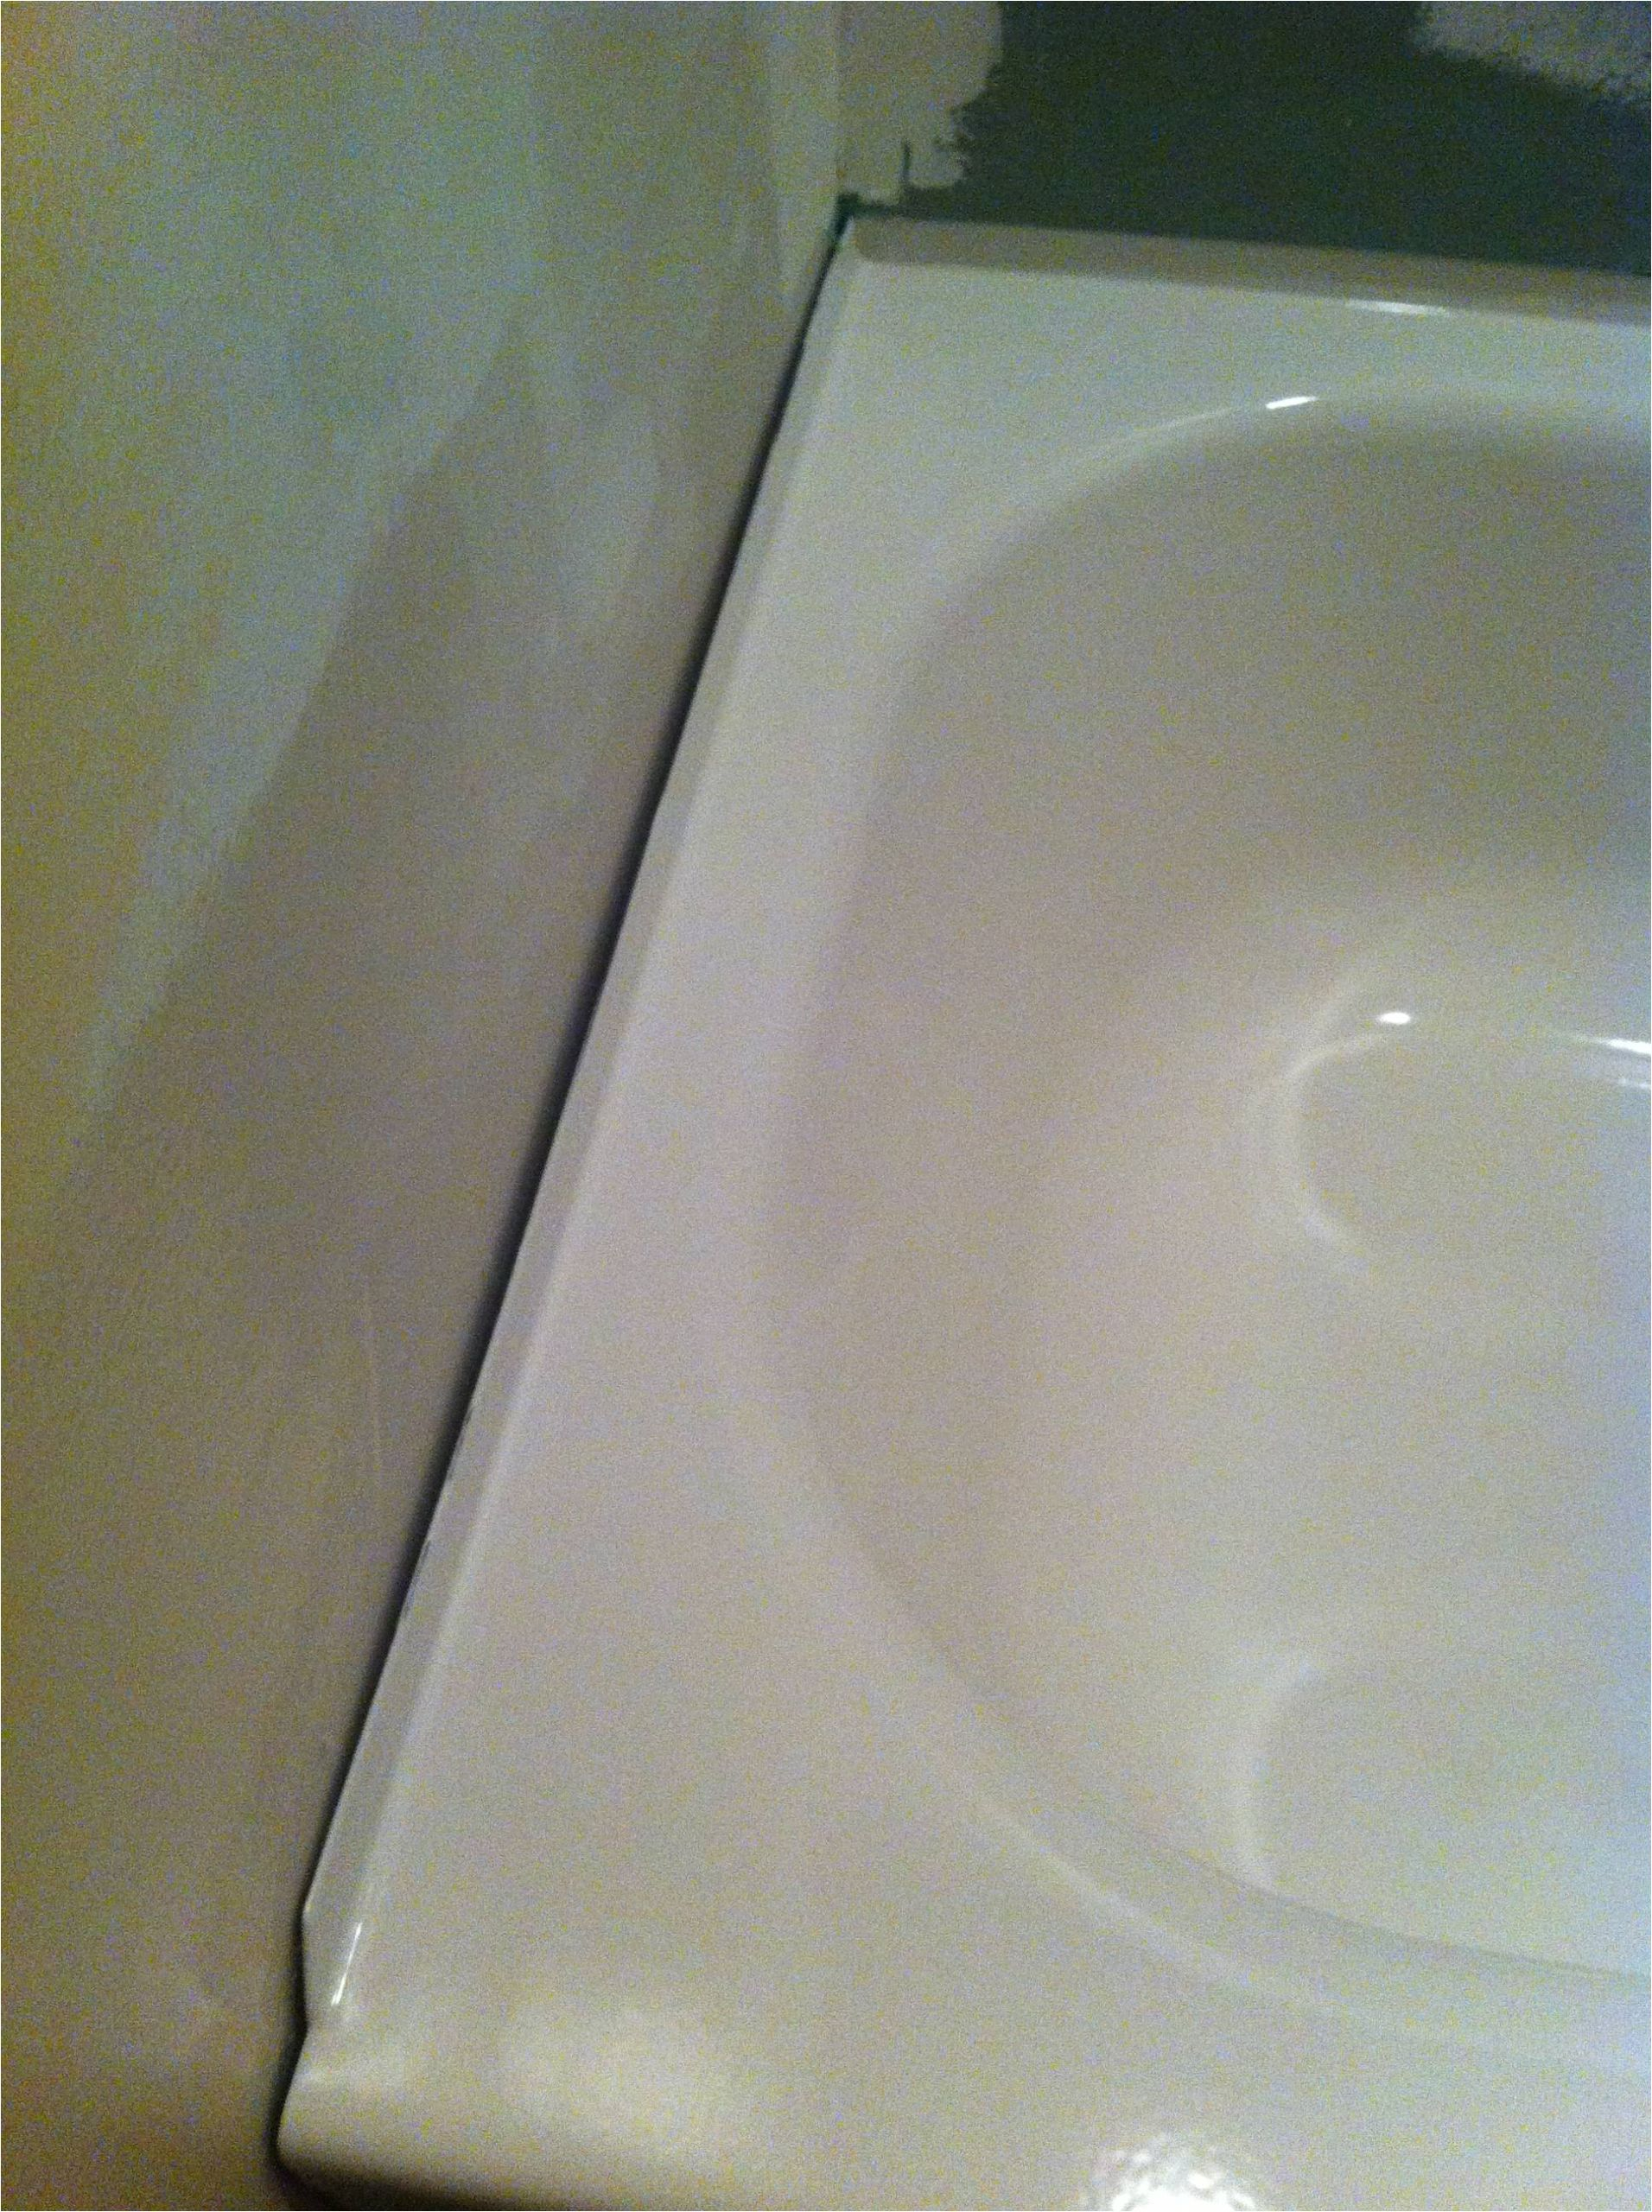 Bathtub Surround Over Drywall Tile Around Bathtub Over Drywall Vs Vapor Shield